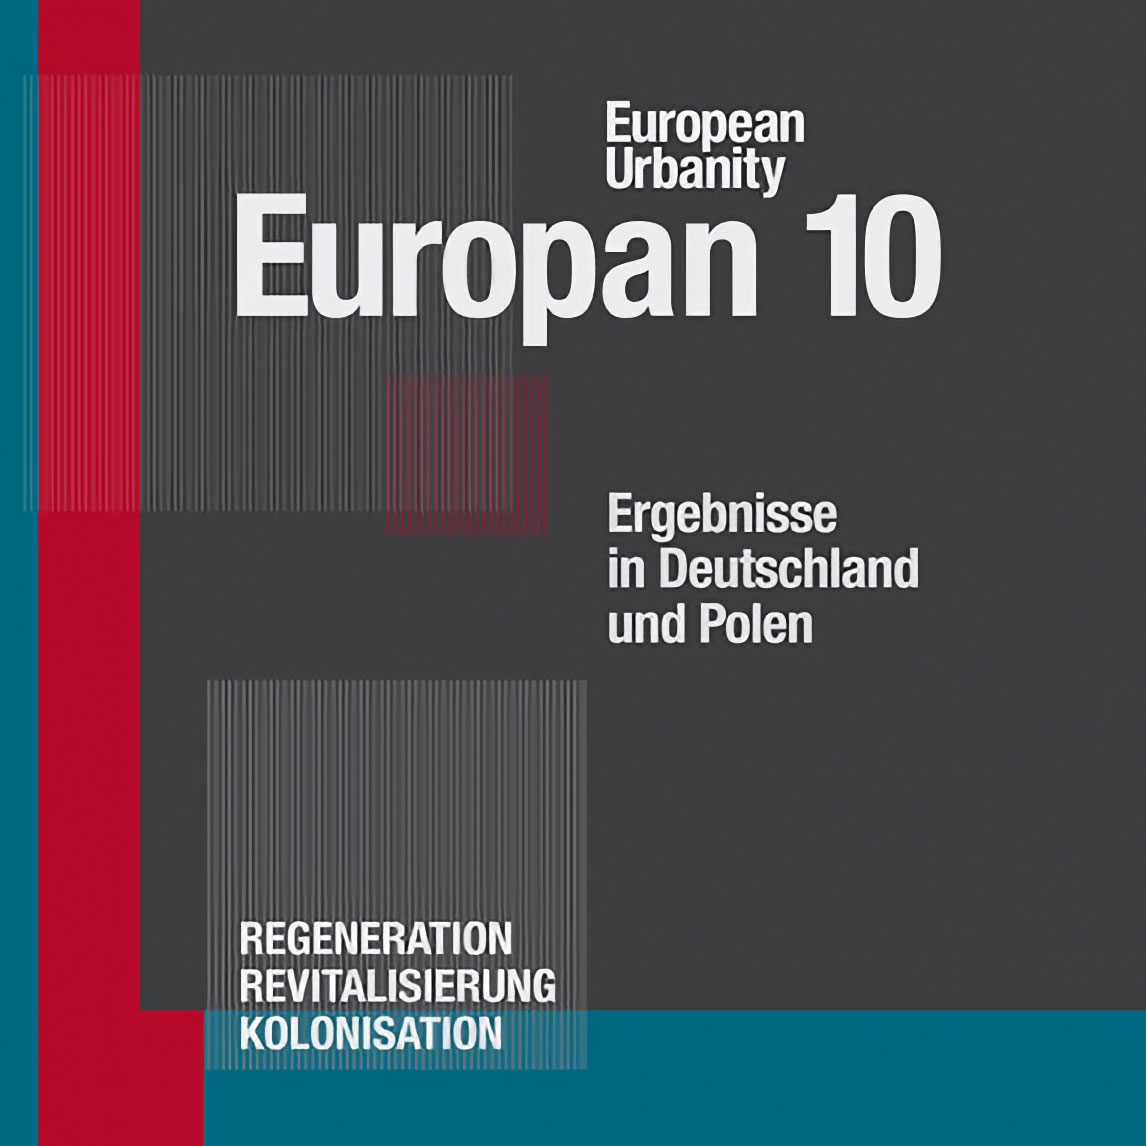 Europan 10<br /> European Urbanity / Kolonisation, Revitalisierung, Regeneration